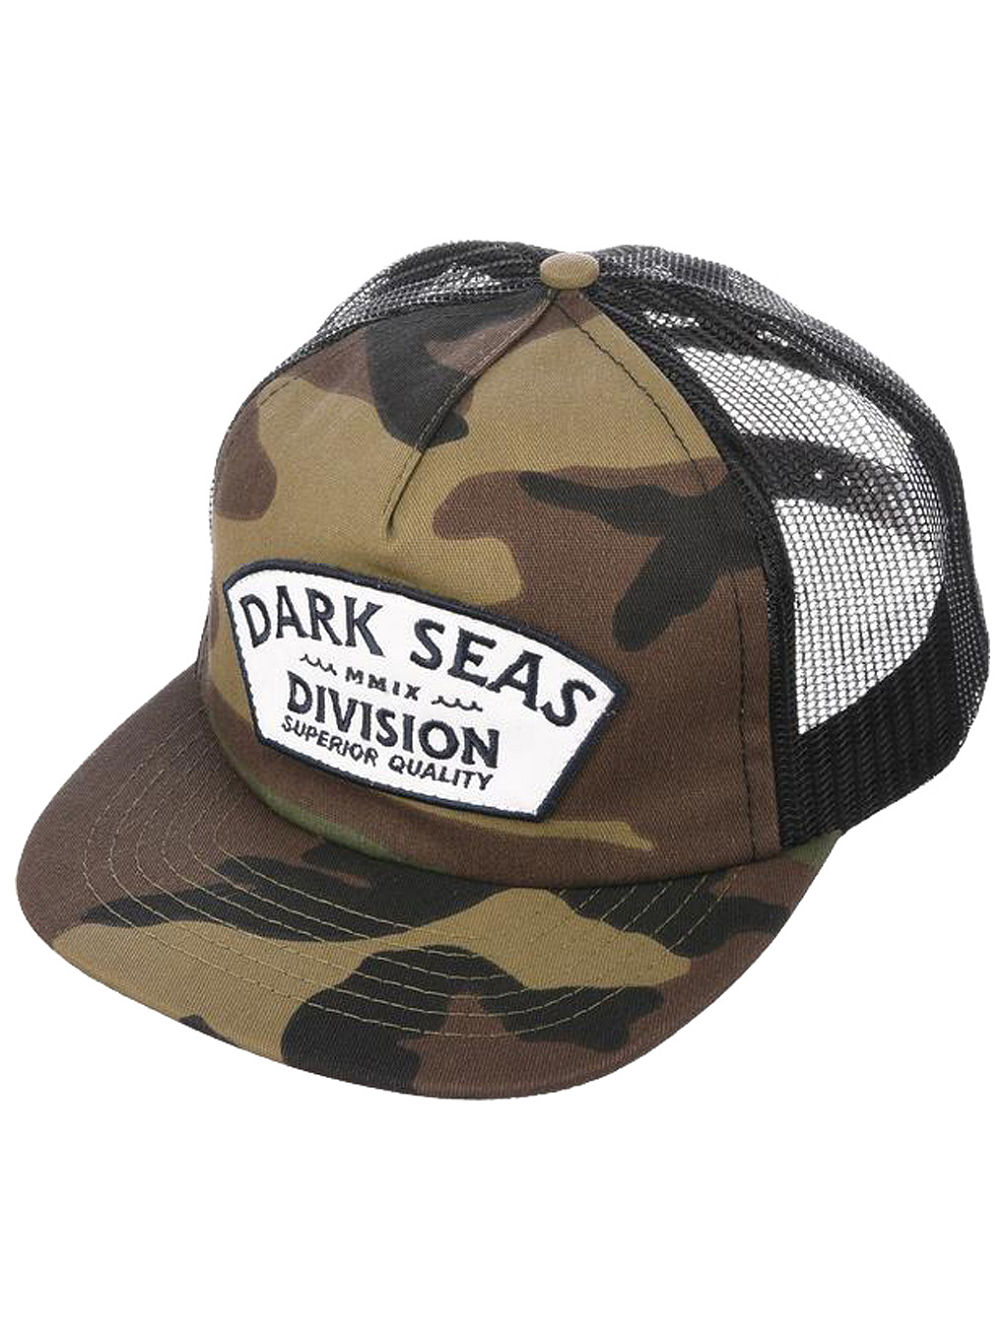 Buy Dark Seas Duane Cap online at blue-tomato.com f9e1f24f37c6